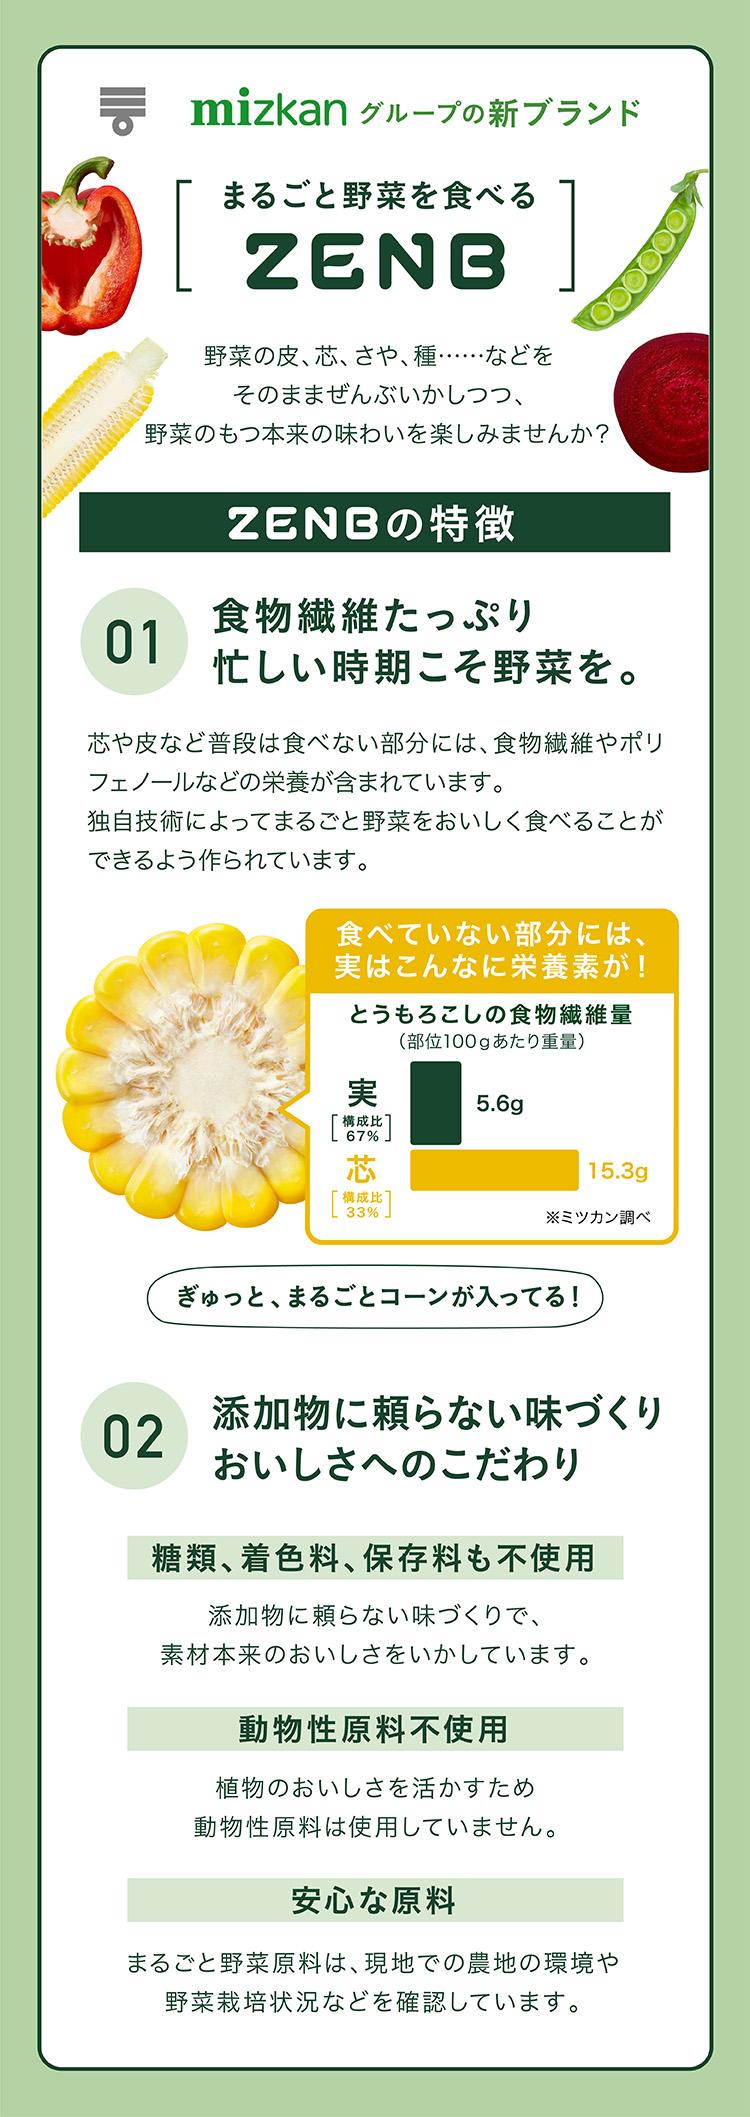 mizkan(ミツカン)グループの新ブランド、まるごと野菜を食べる「ZENB(ゼンブ)」